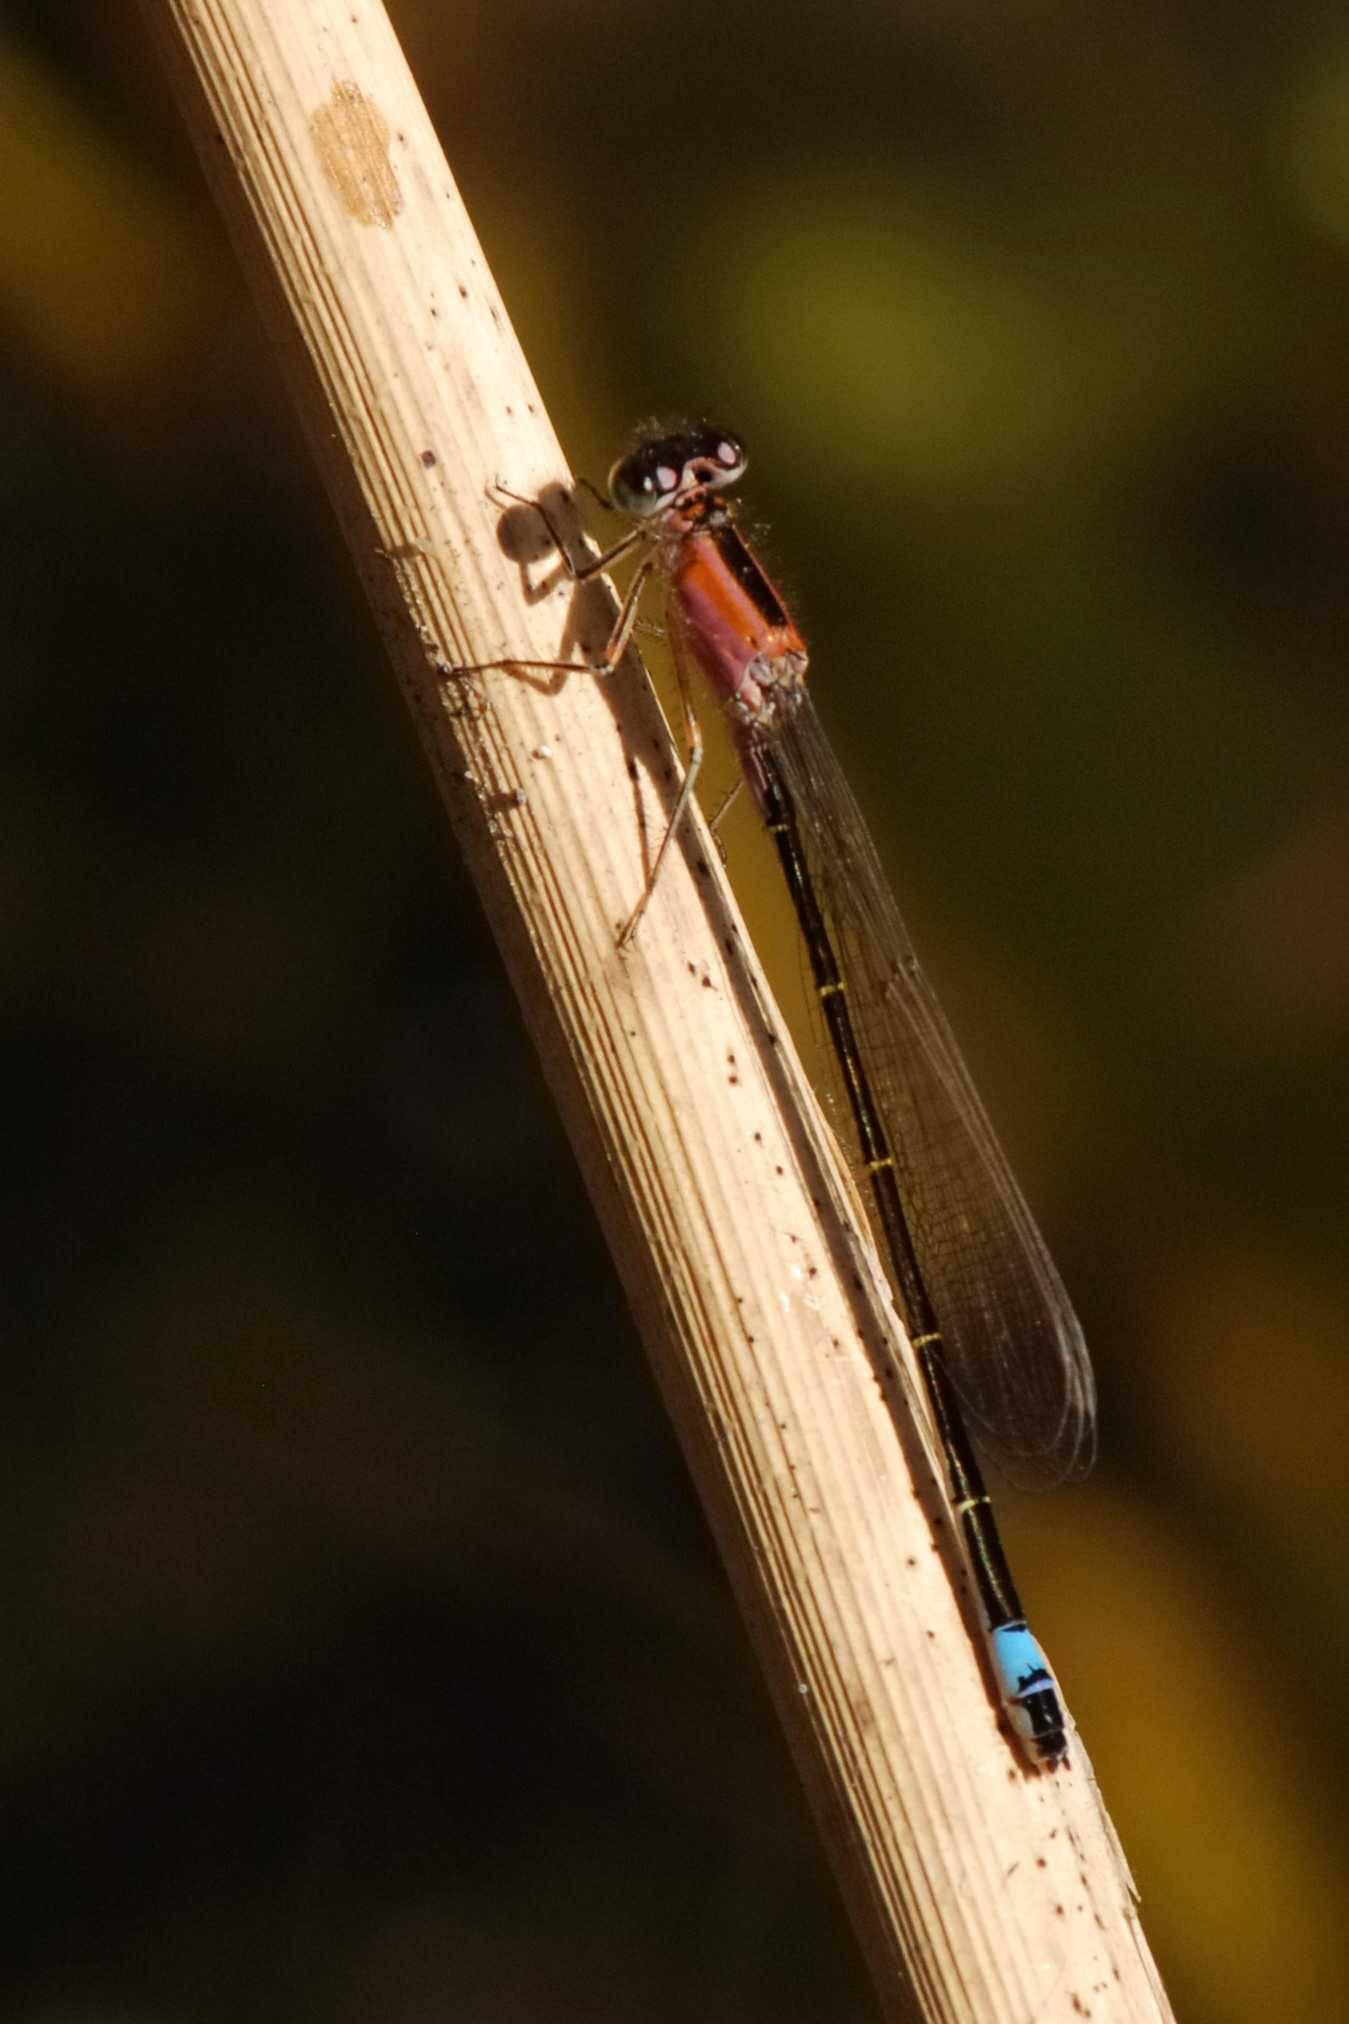 Common Bluetail - ISCHNURA ELEGANS